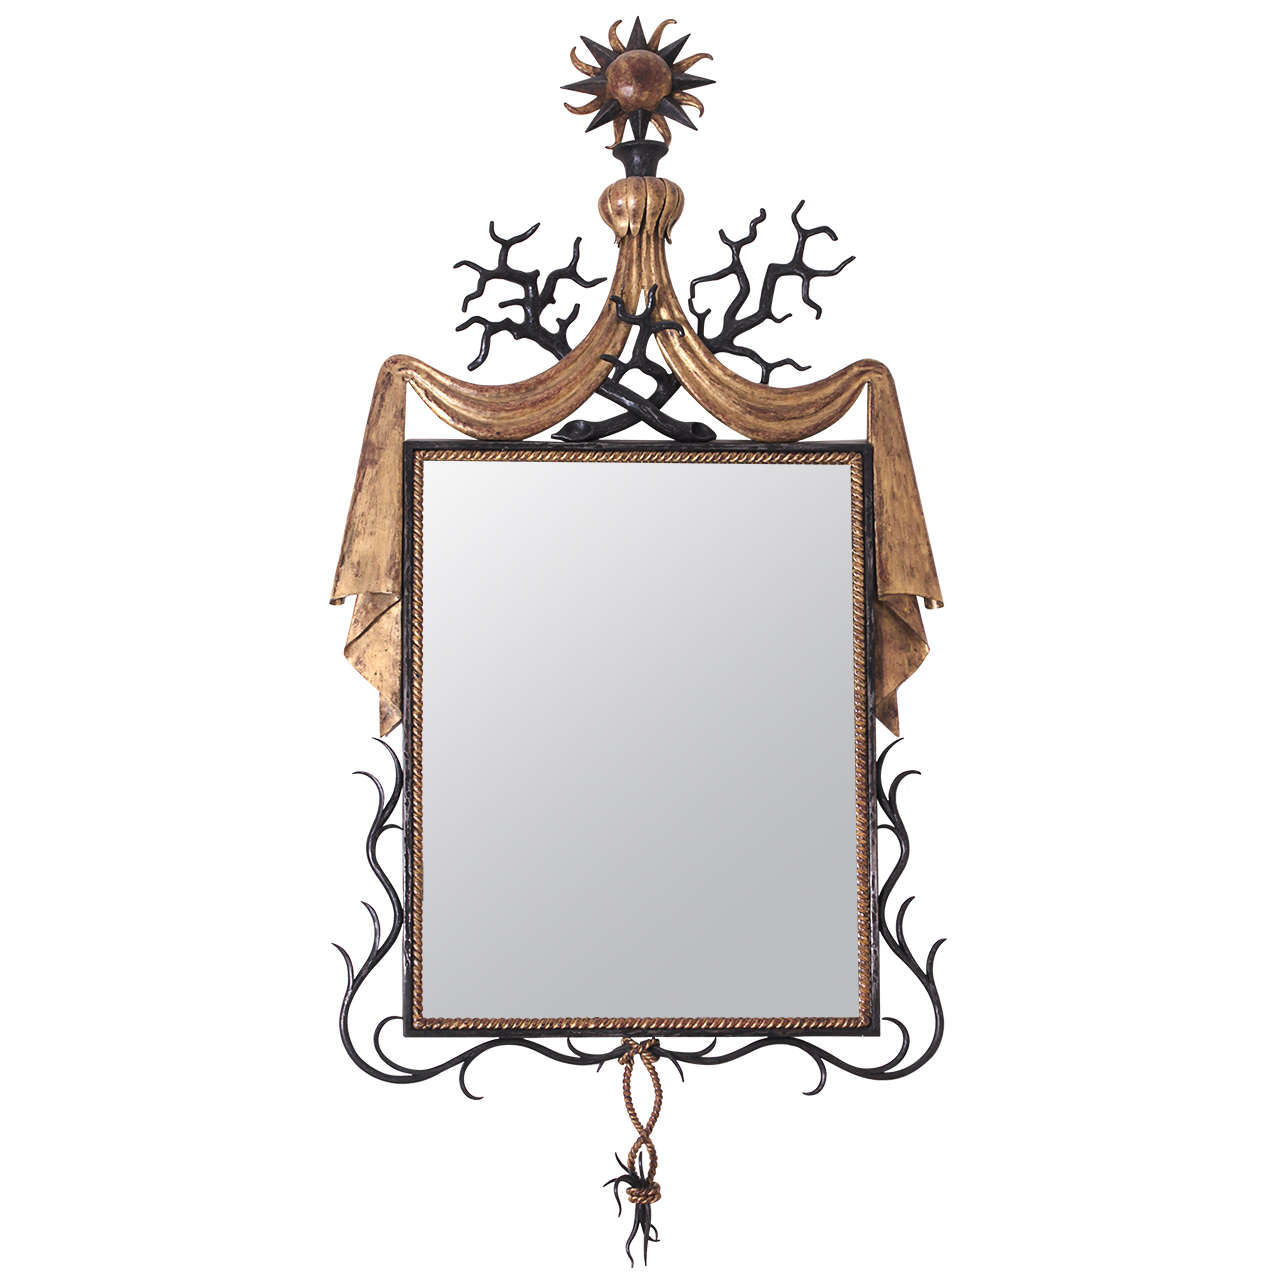 Gilbert Poillerat Parcel Gilt Wrought Iron Mirror French